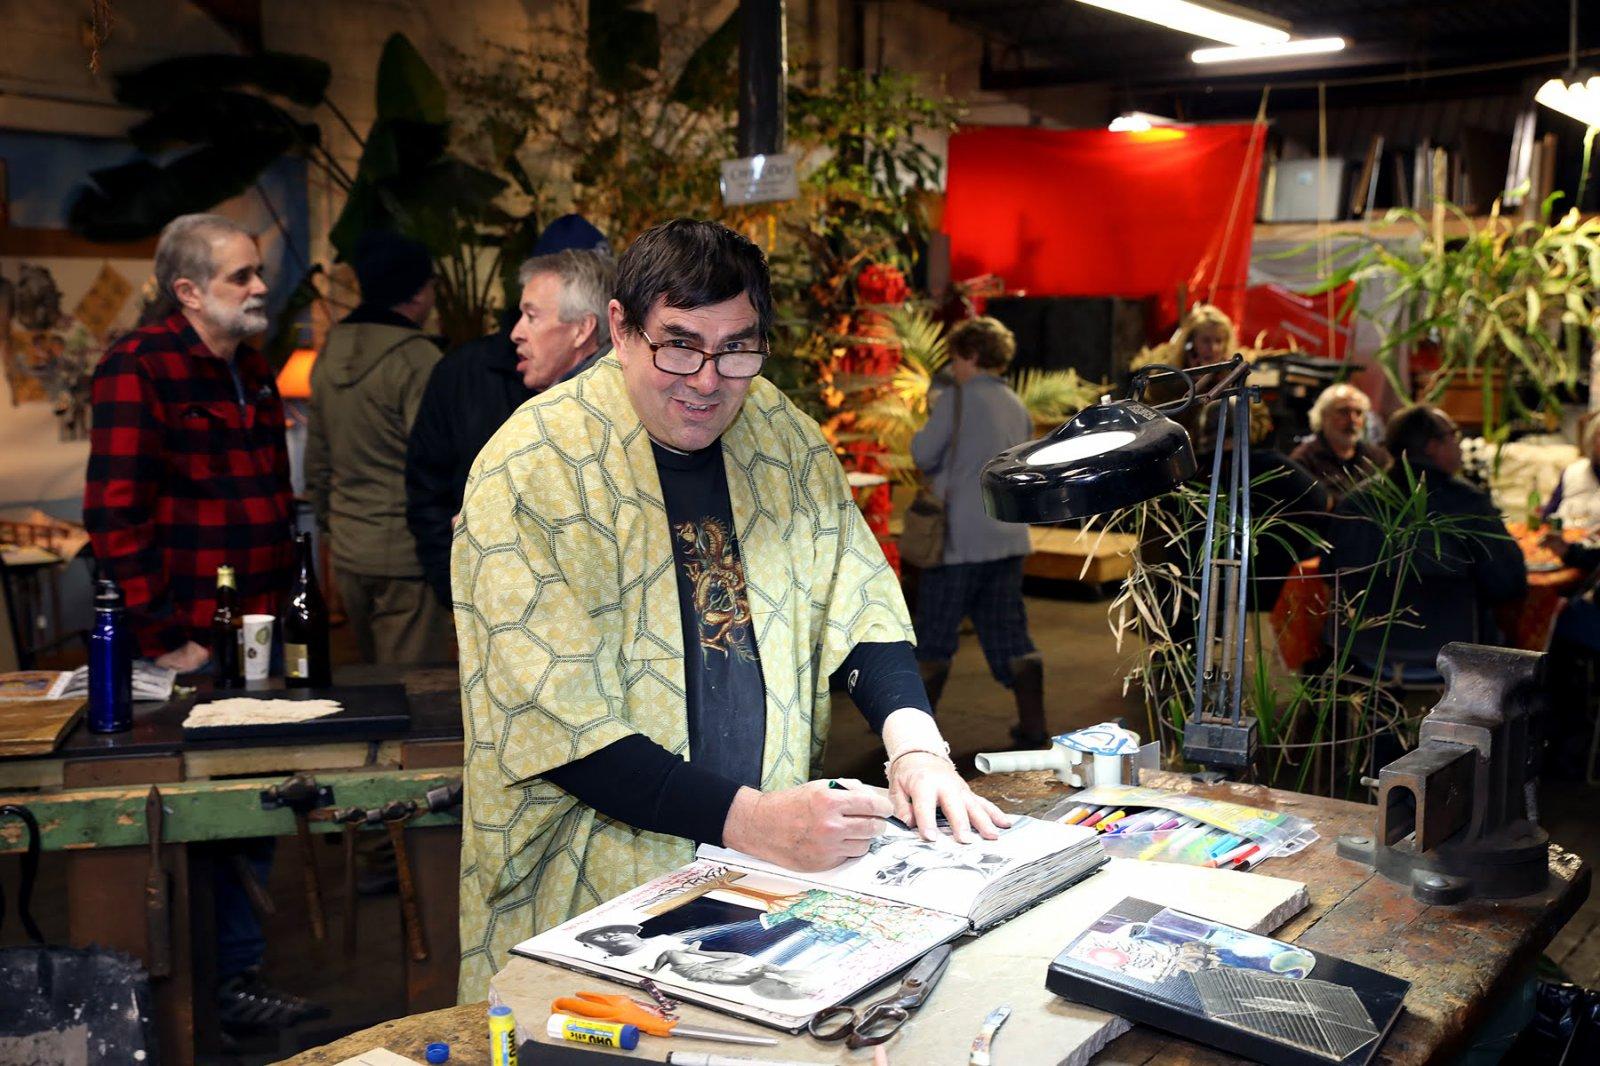 Artist and Vanguard's co-owner Michael Nolte